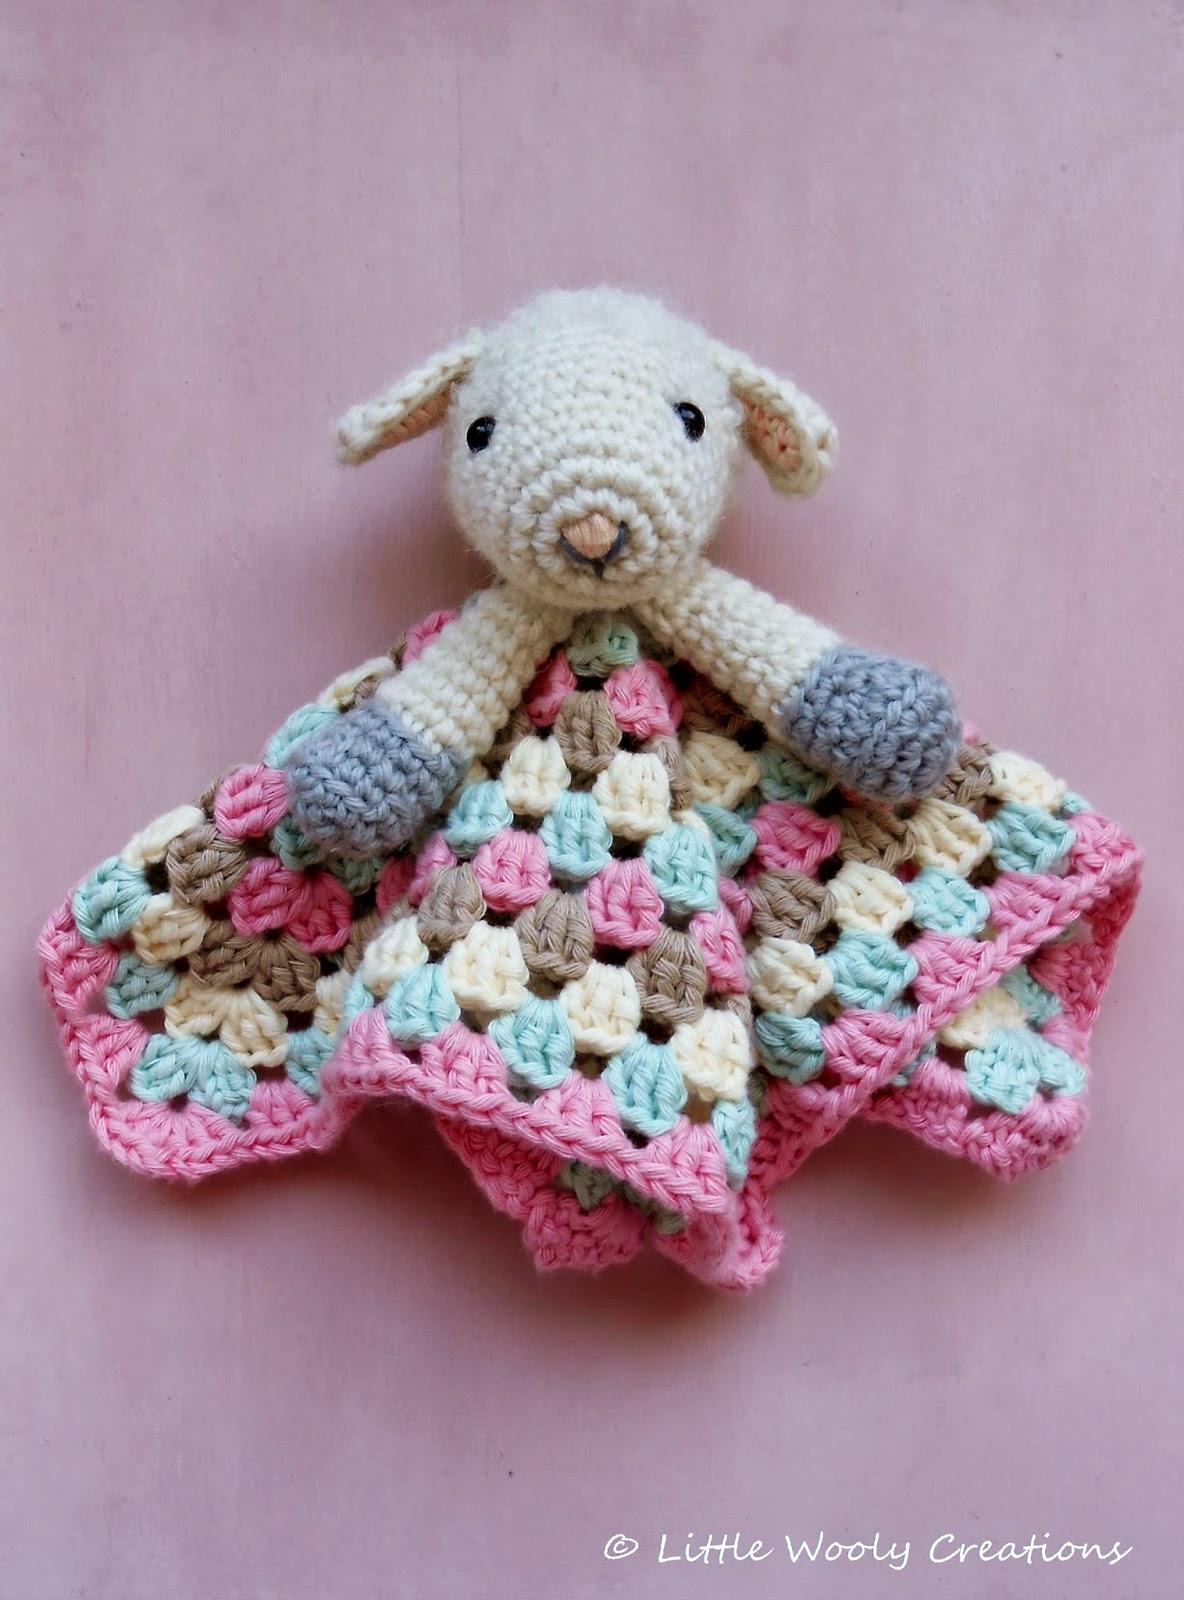 Free Crochet Lamb Cuddle Blanket Pattern : Little Wooly Creations: Lamb Cuddle Blanket